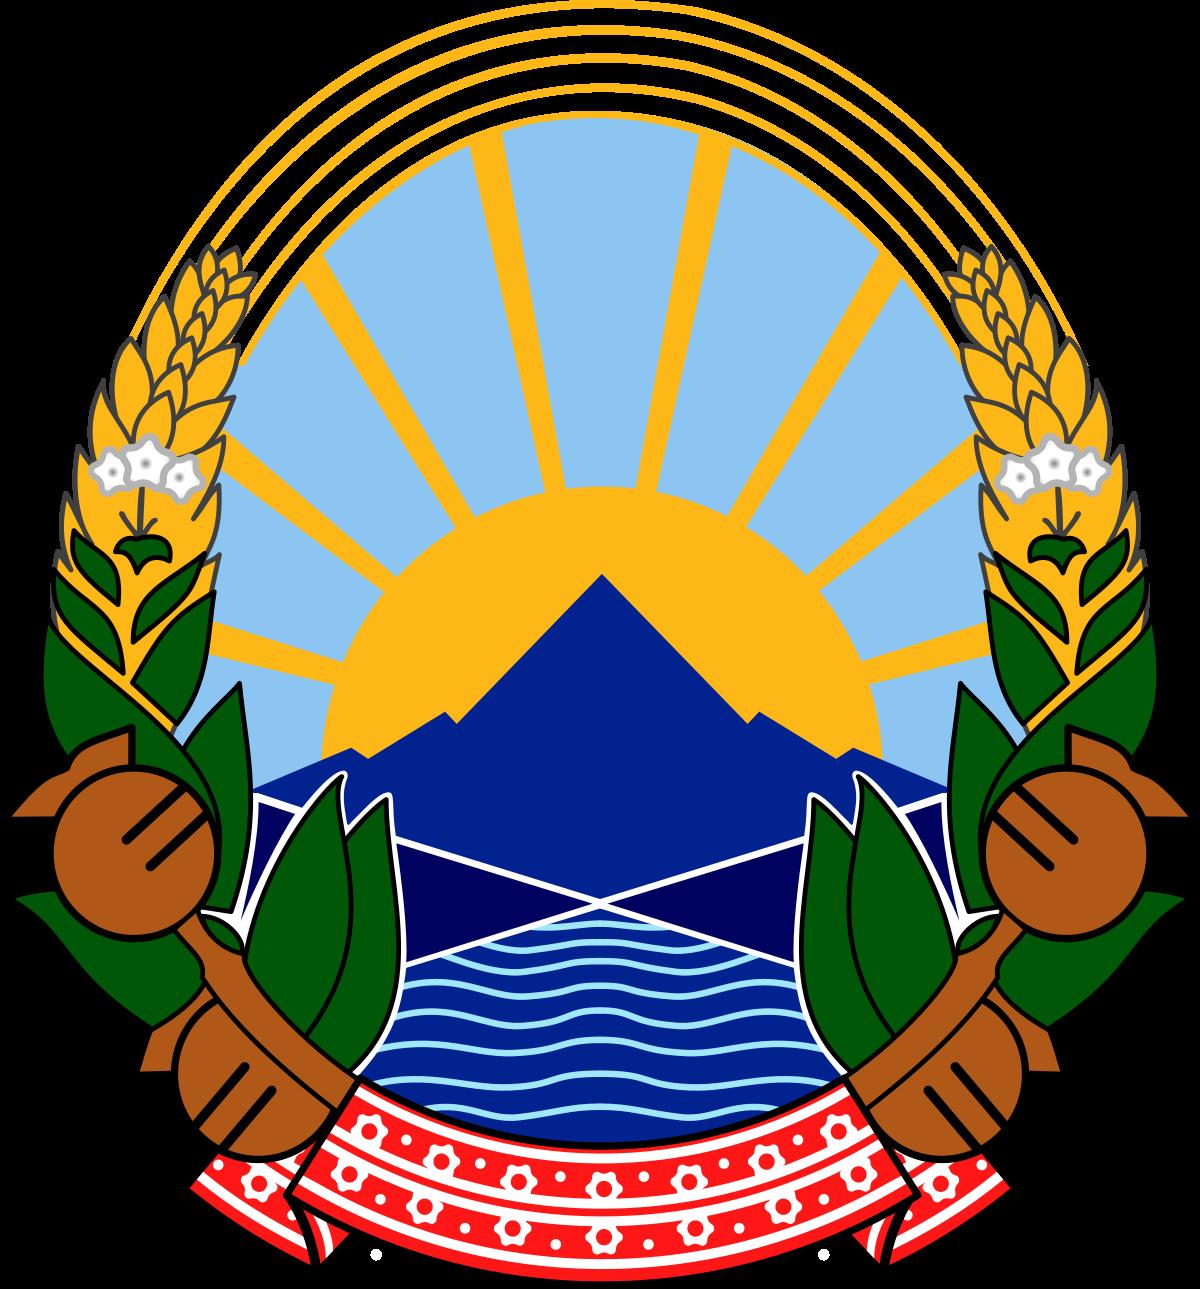 Macedonia coat of arms